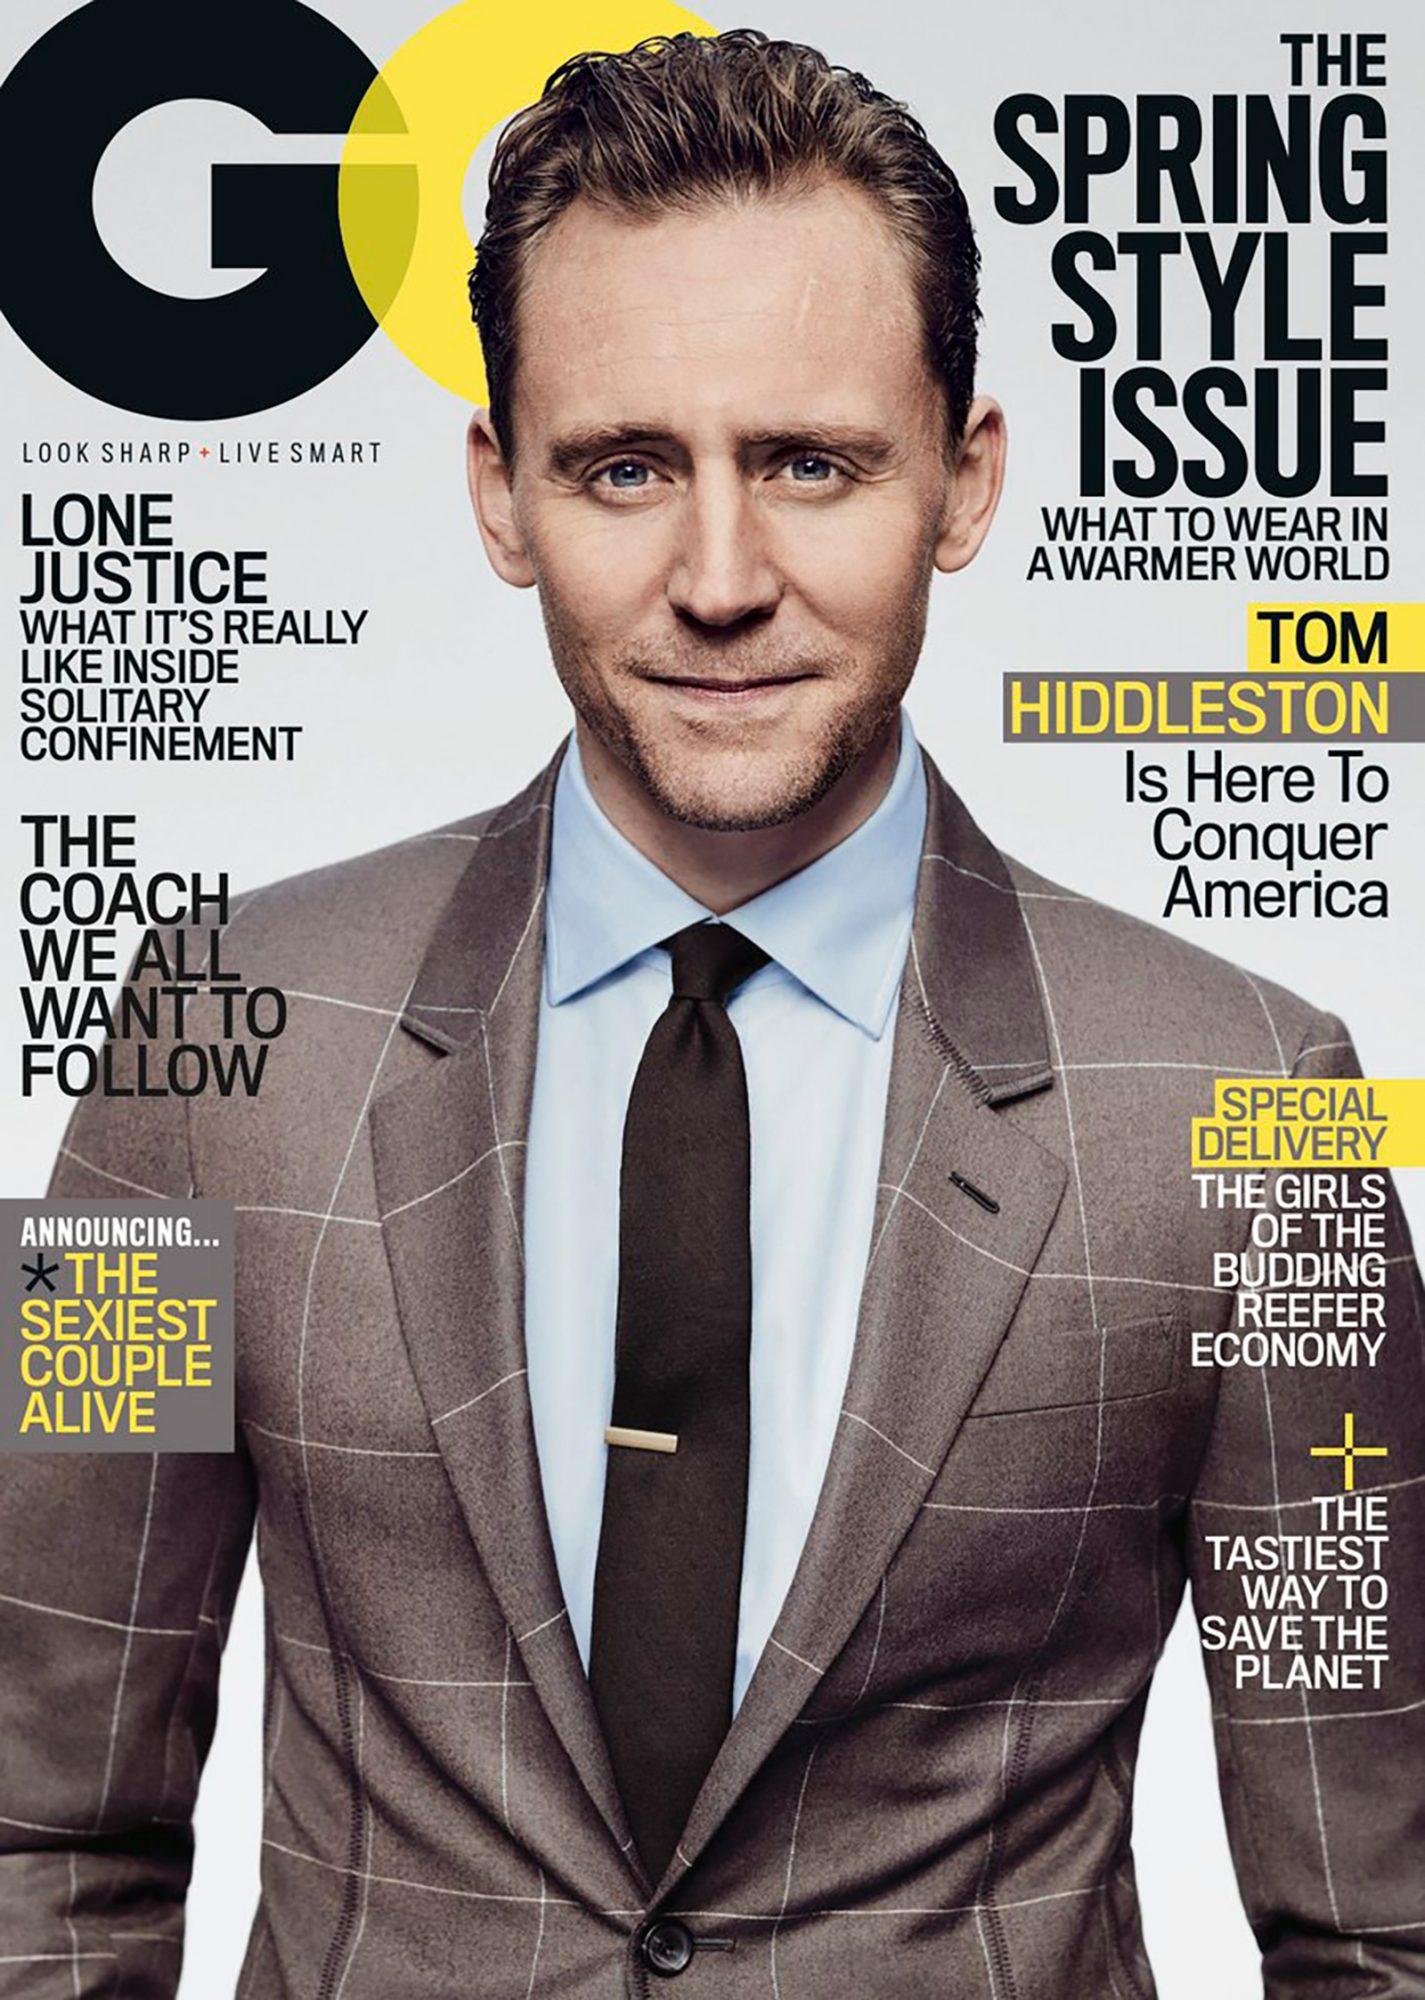 Tom Hiddleston GQ cover